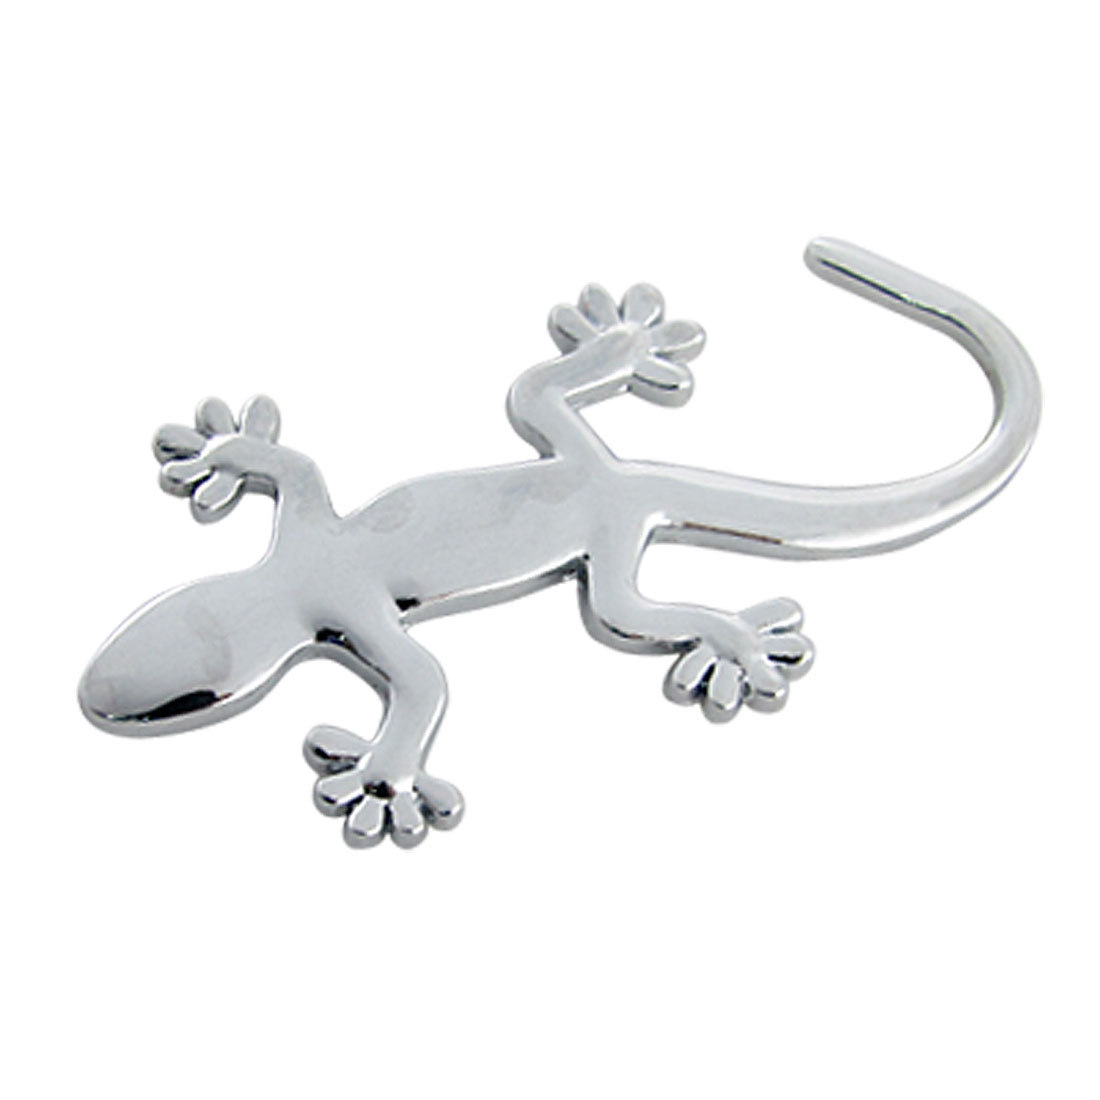 Silver Tone Metal Wall Gecko Shaped 3D Sticker Car Decor